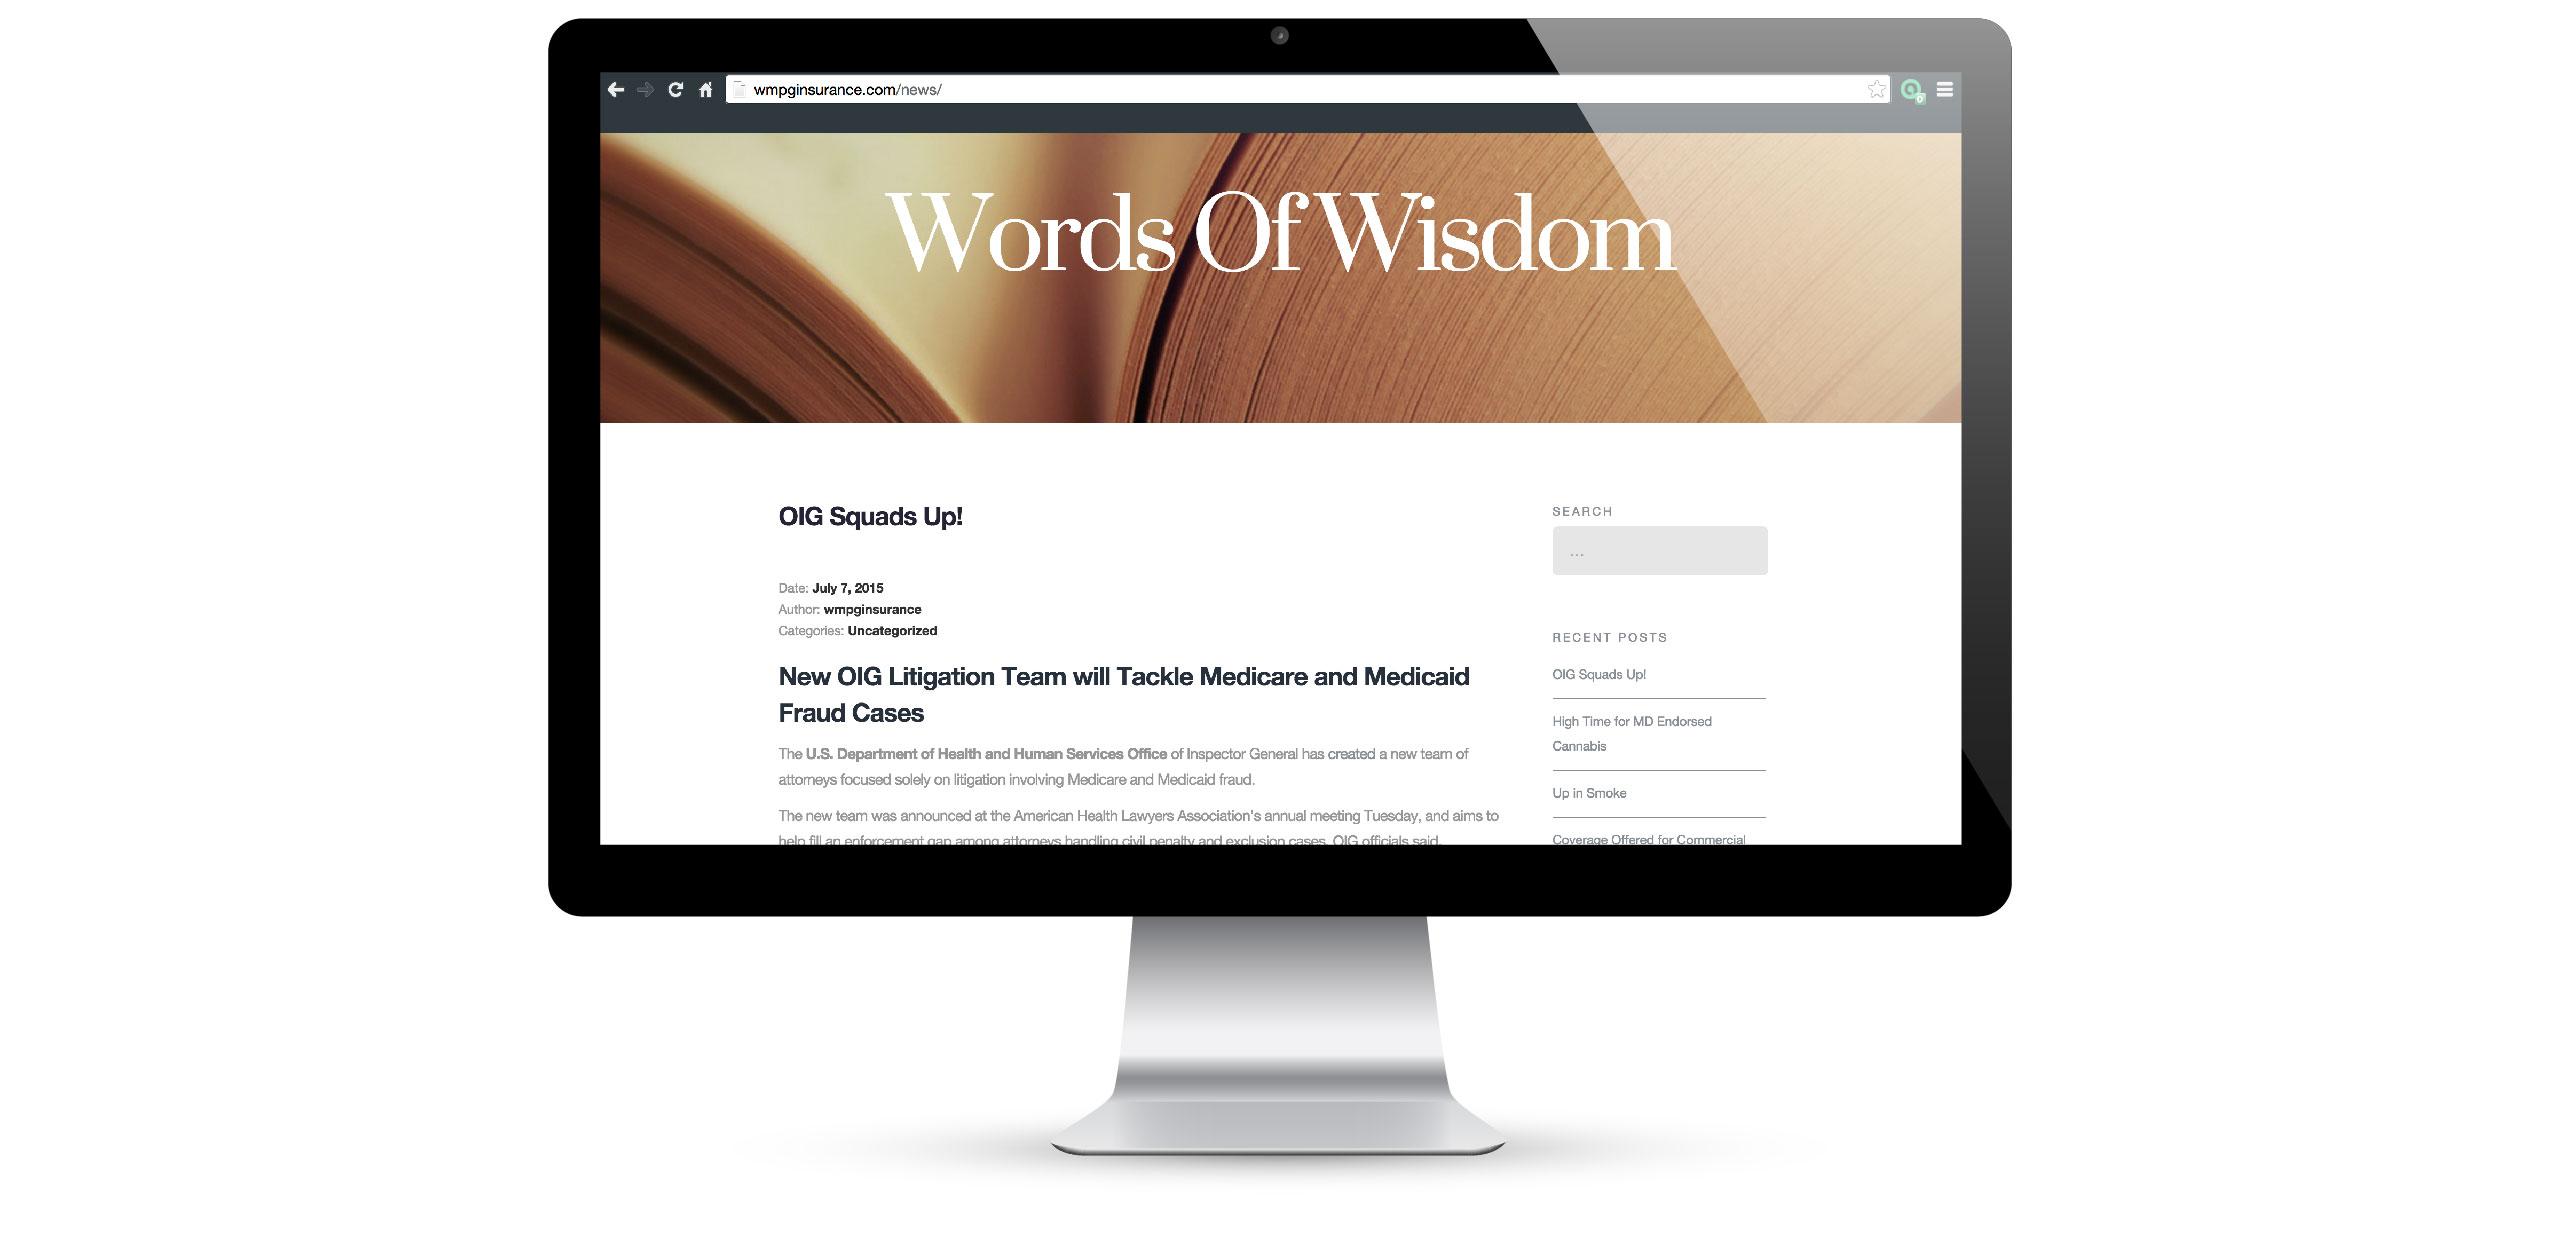 WMPG-Computer-Blog-Display_MB081715-01